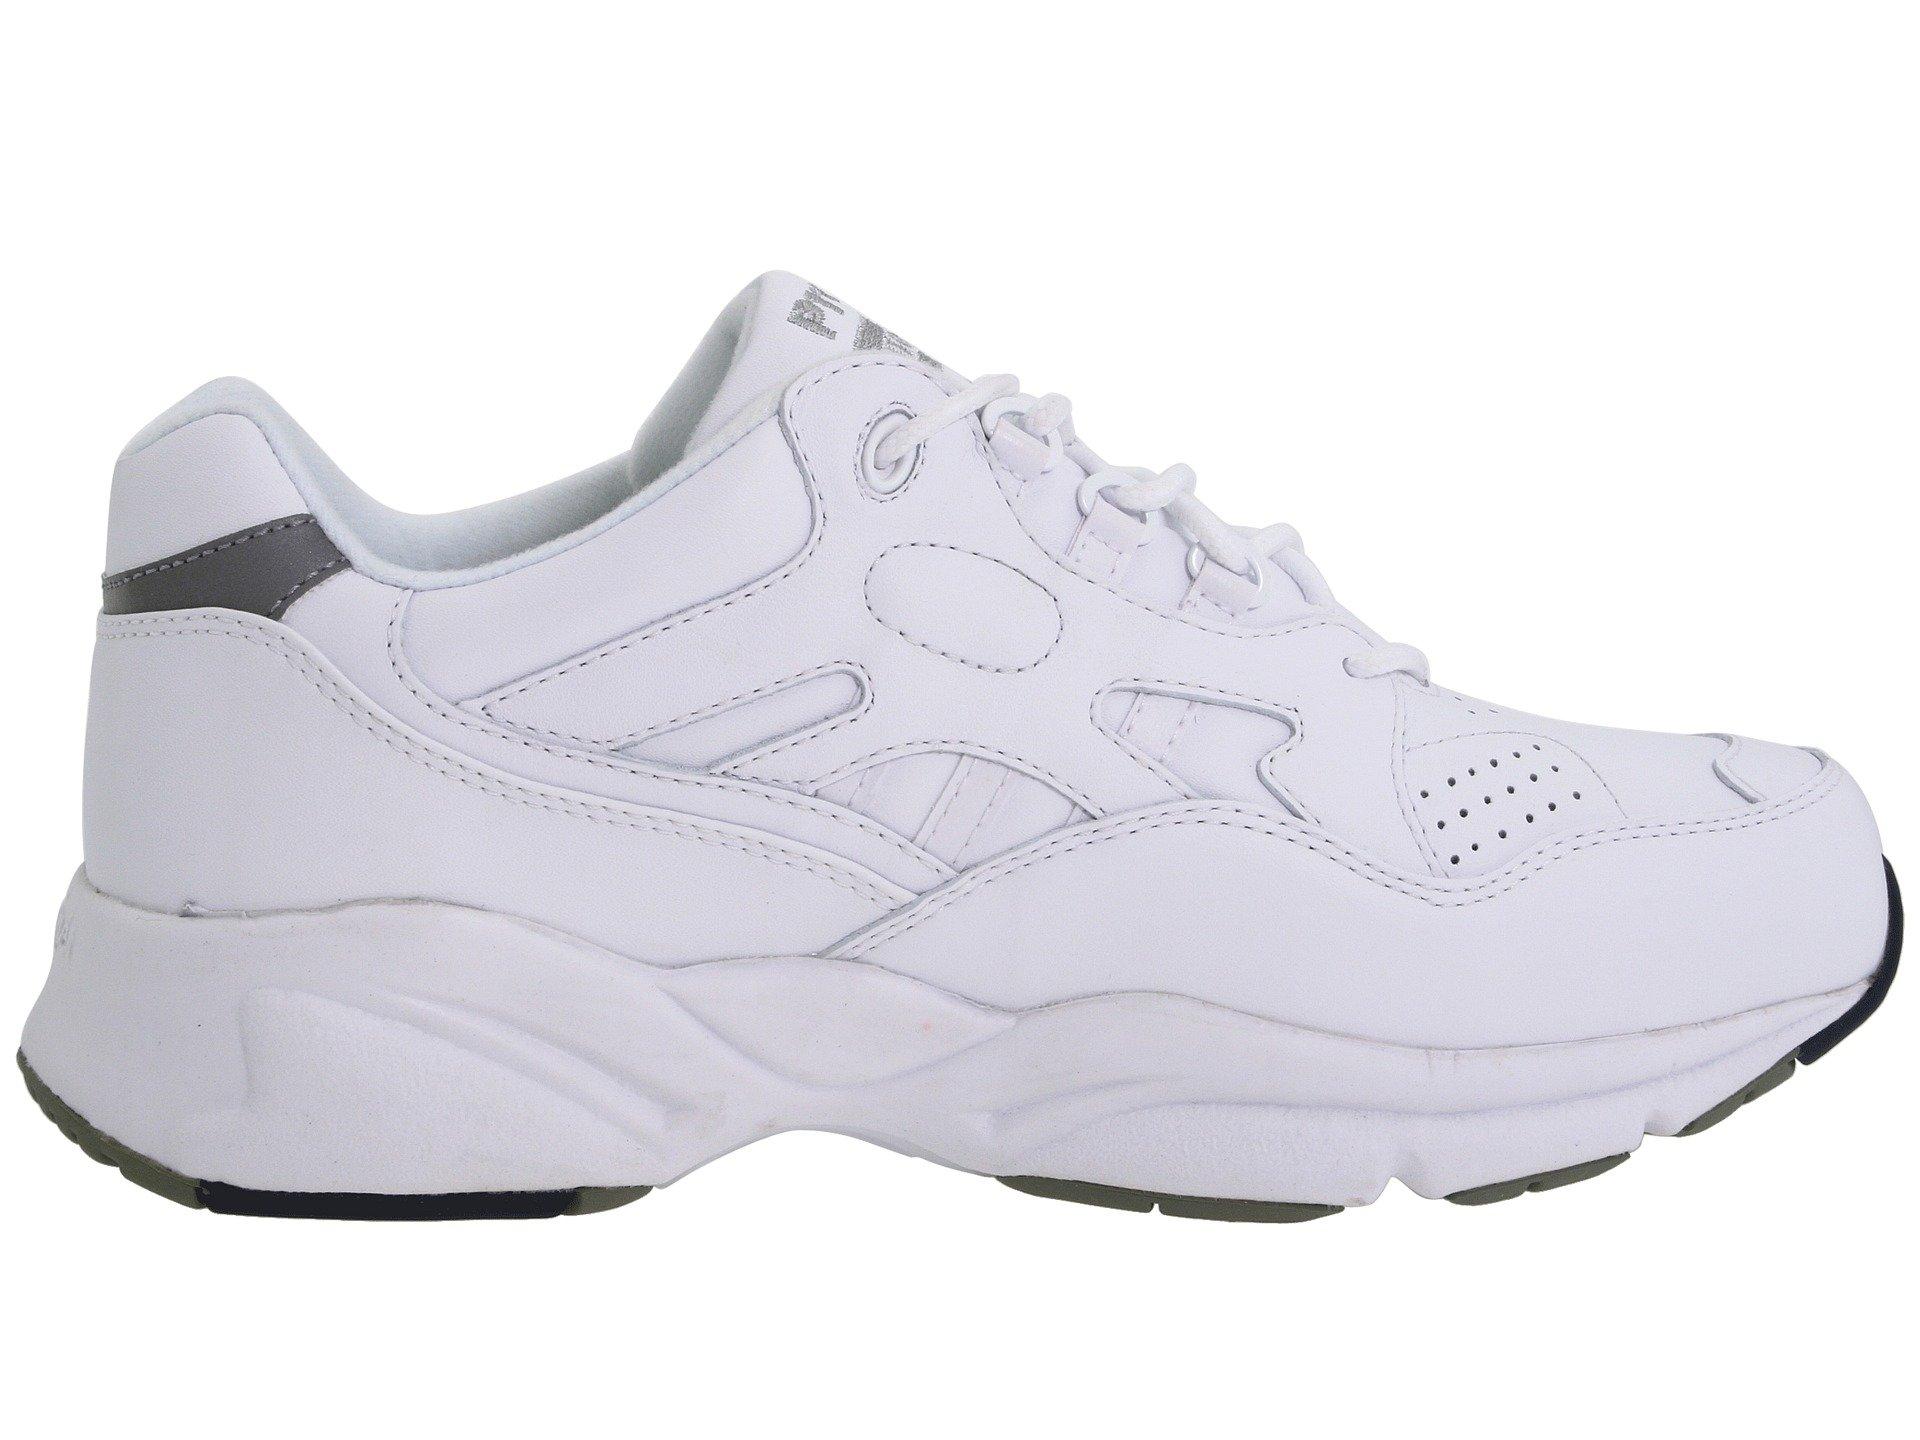 Shoe Code White Medicare Leather A5500 hcpcs Walker Stability Diabetic Propet xFqOTaw